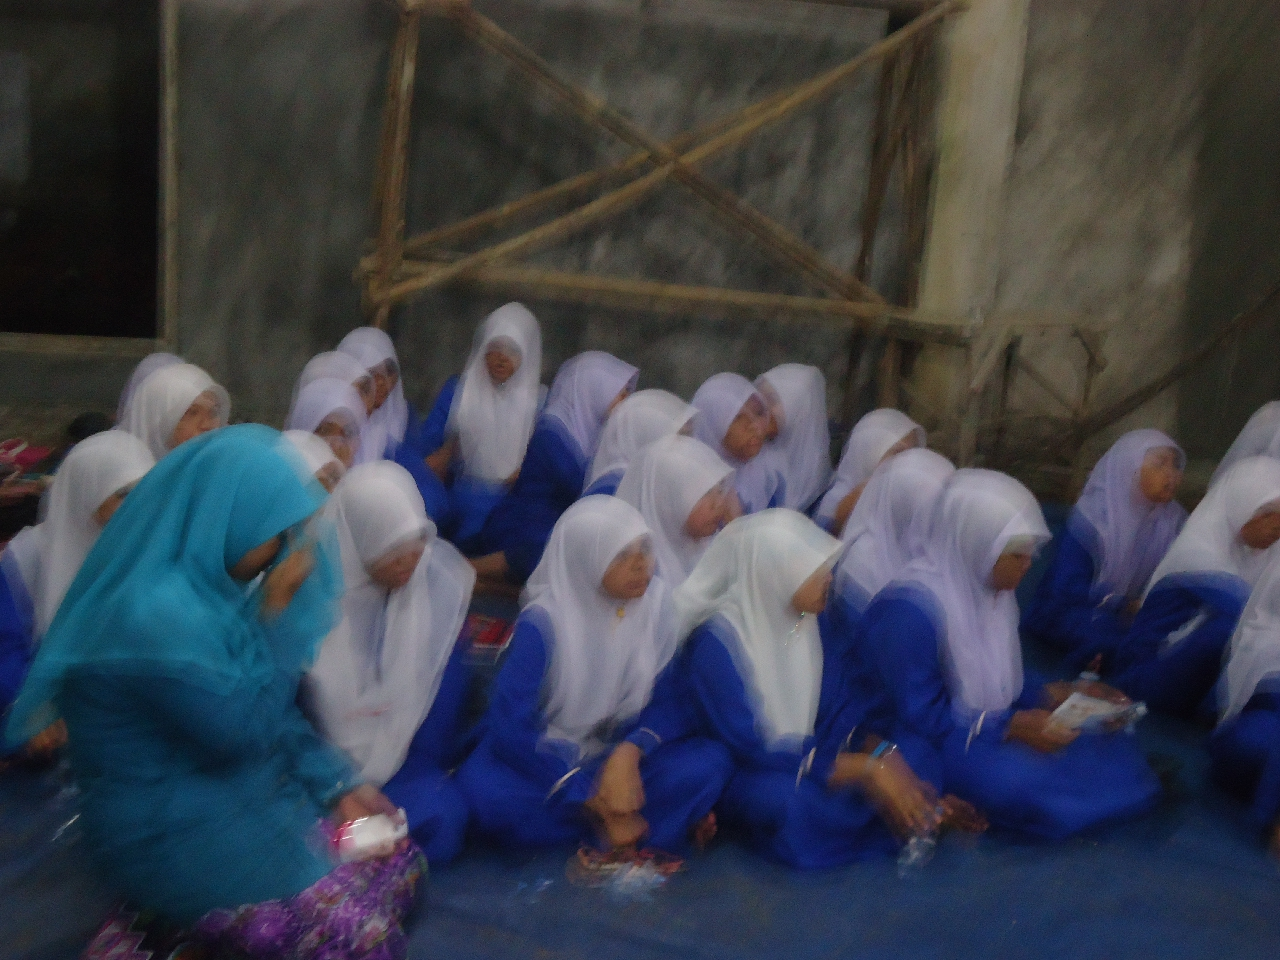 Pergantian Pengurus Ikatan Santri Darul 'Amal (ISDA) 2014-2015